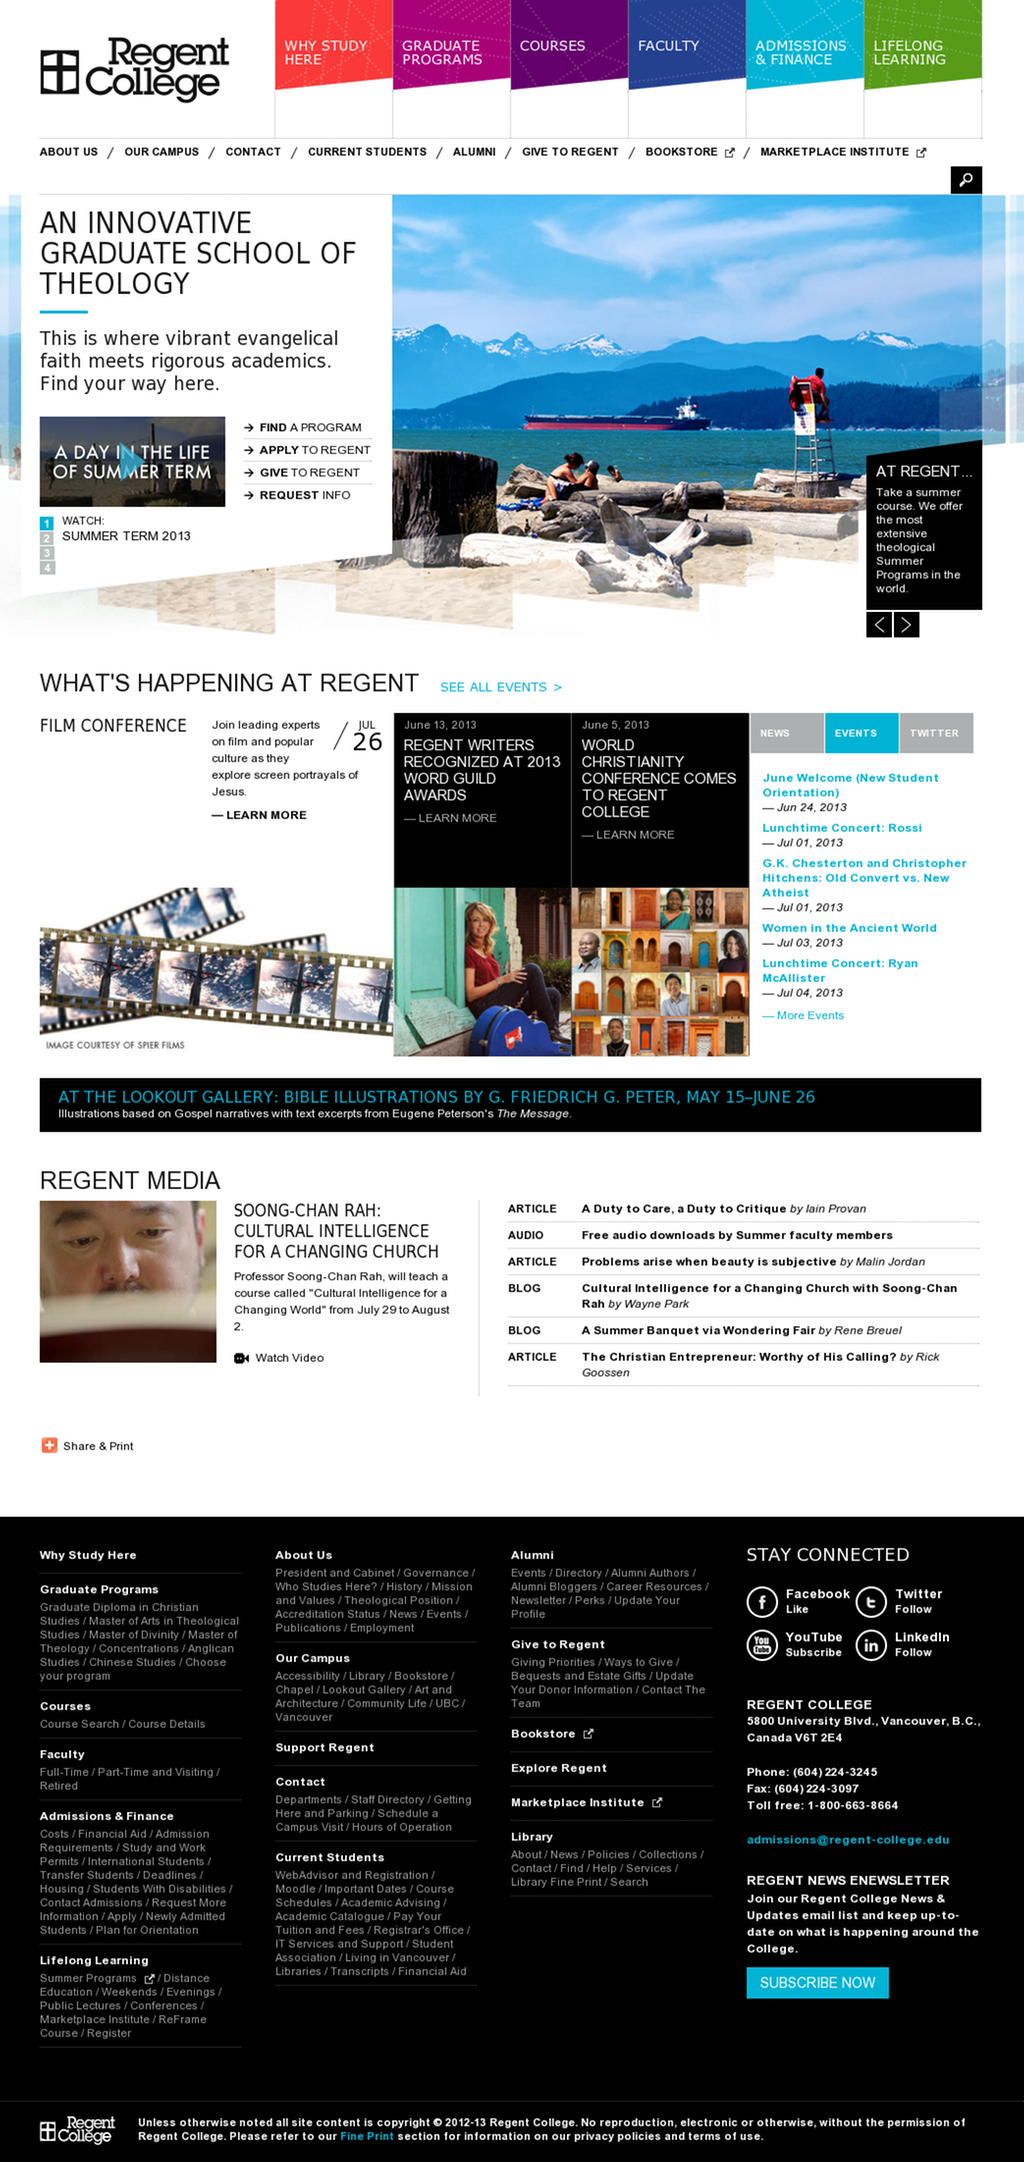 Http Www Regent College Edu I Notice That They Eschew Opening Menus At Small Resolutions Web Design Web Design Inspiration Graduate School